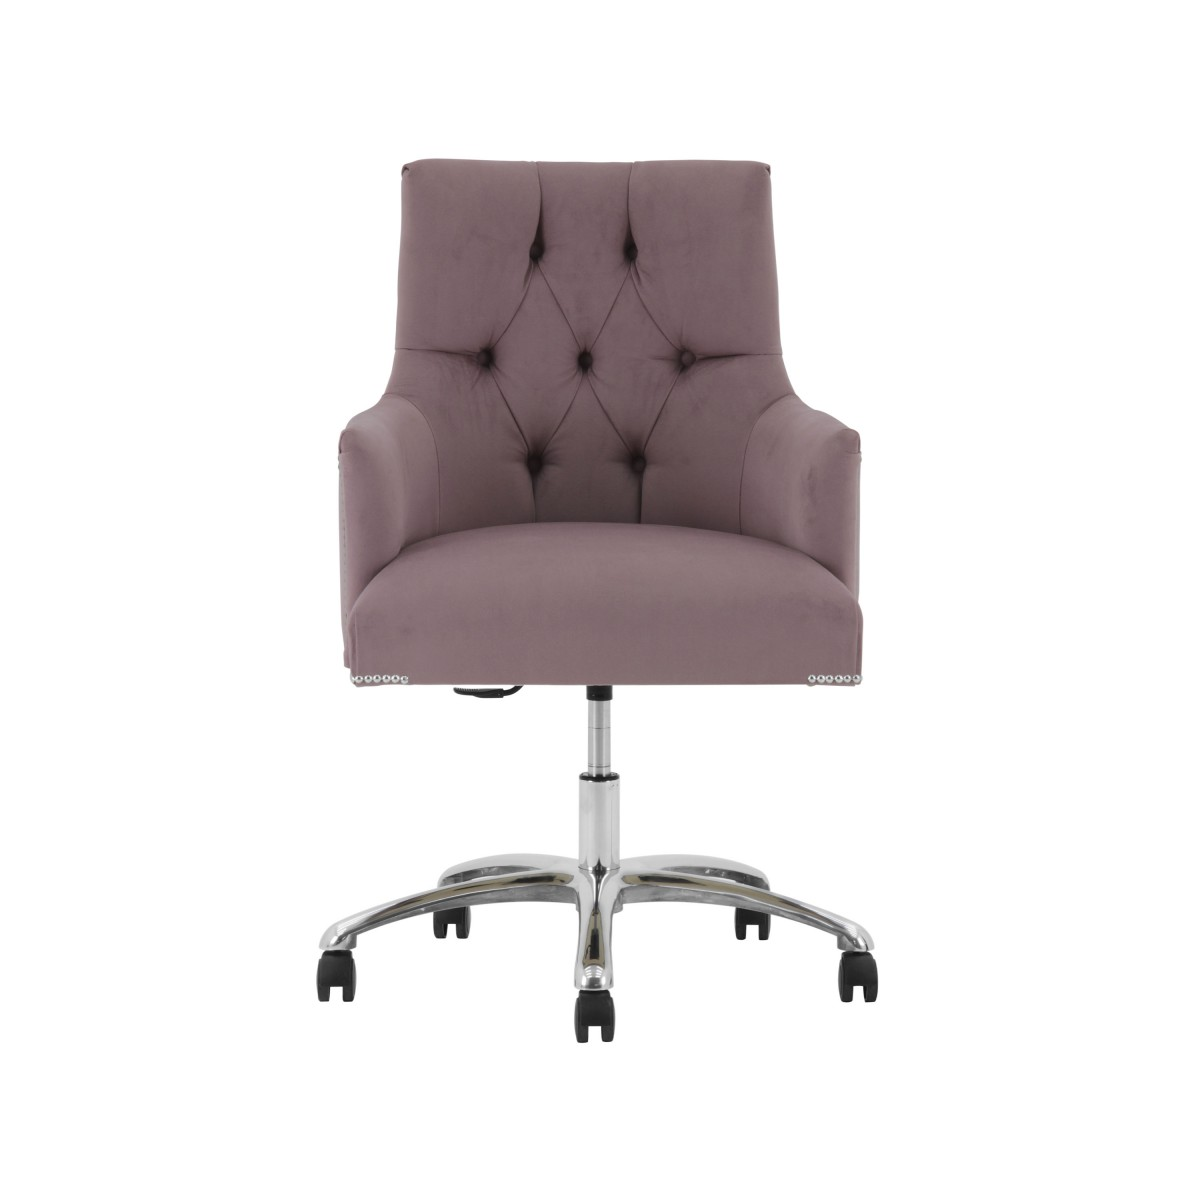 Small armchair Future - Sevensedie